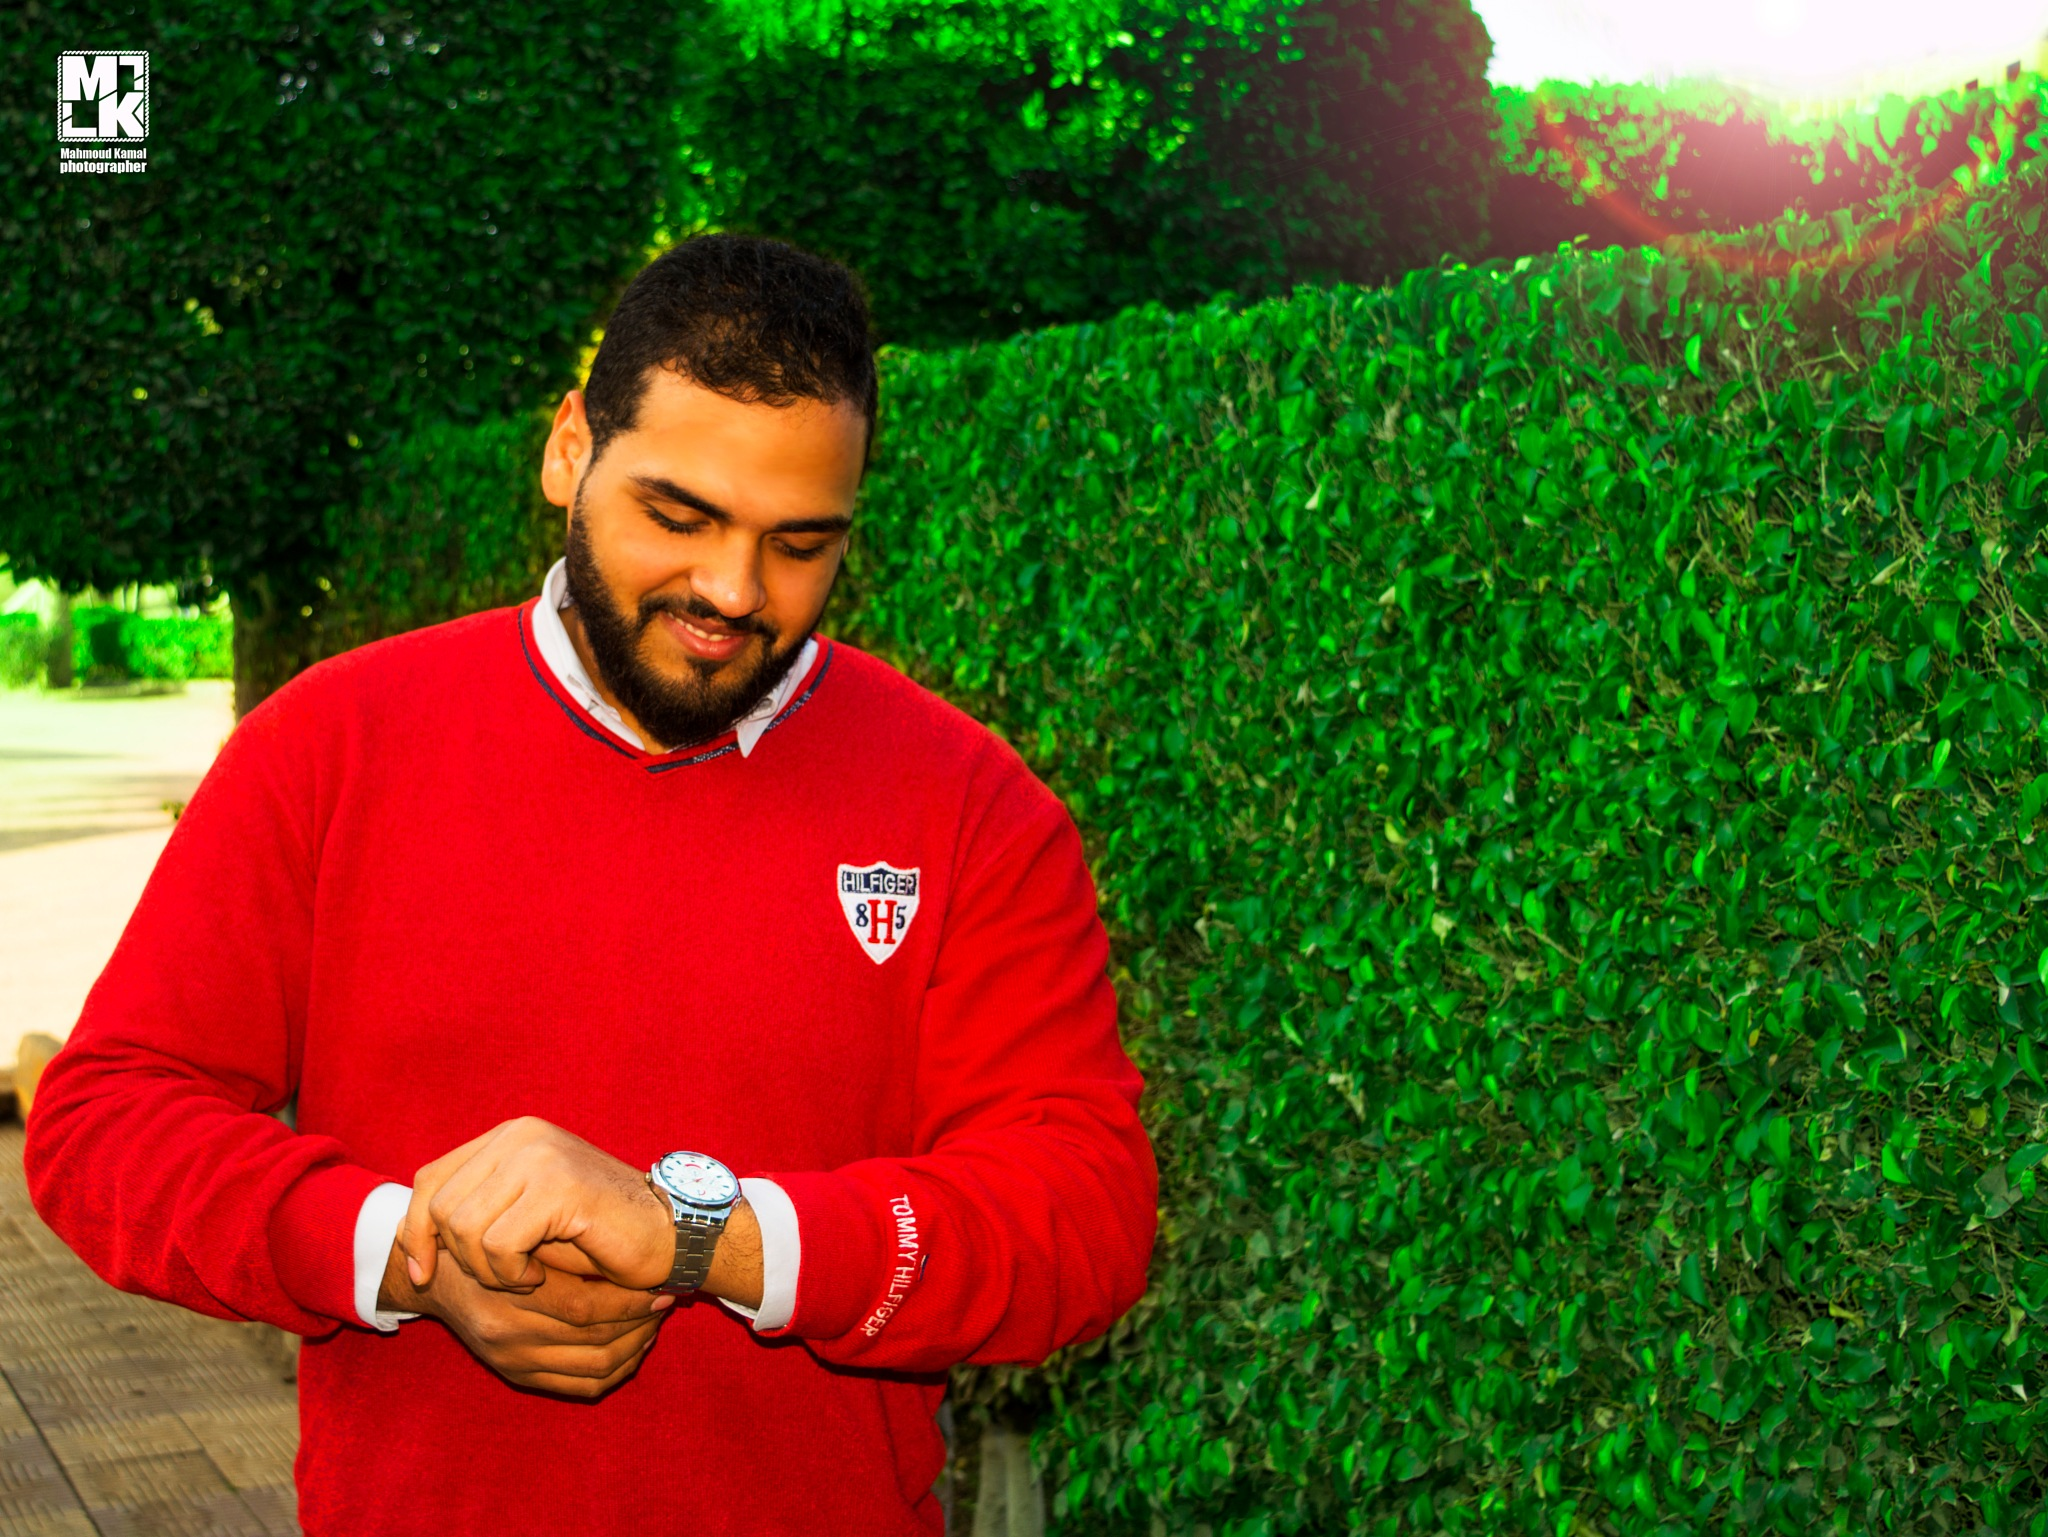 portrait ahmed wageeh by Mahmoud Kamal